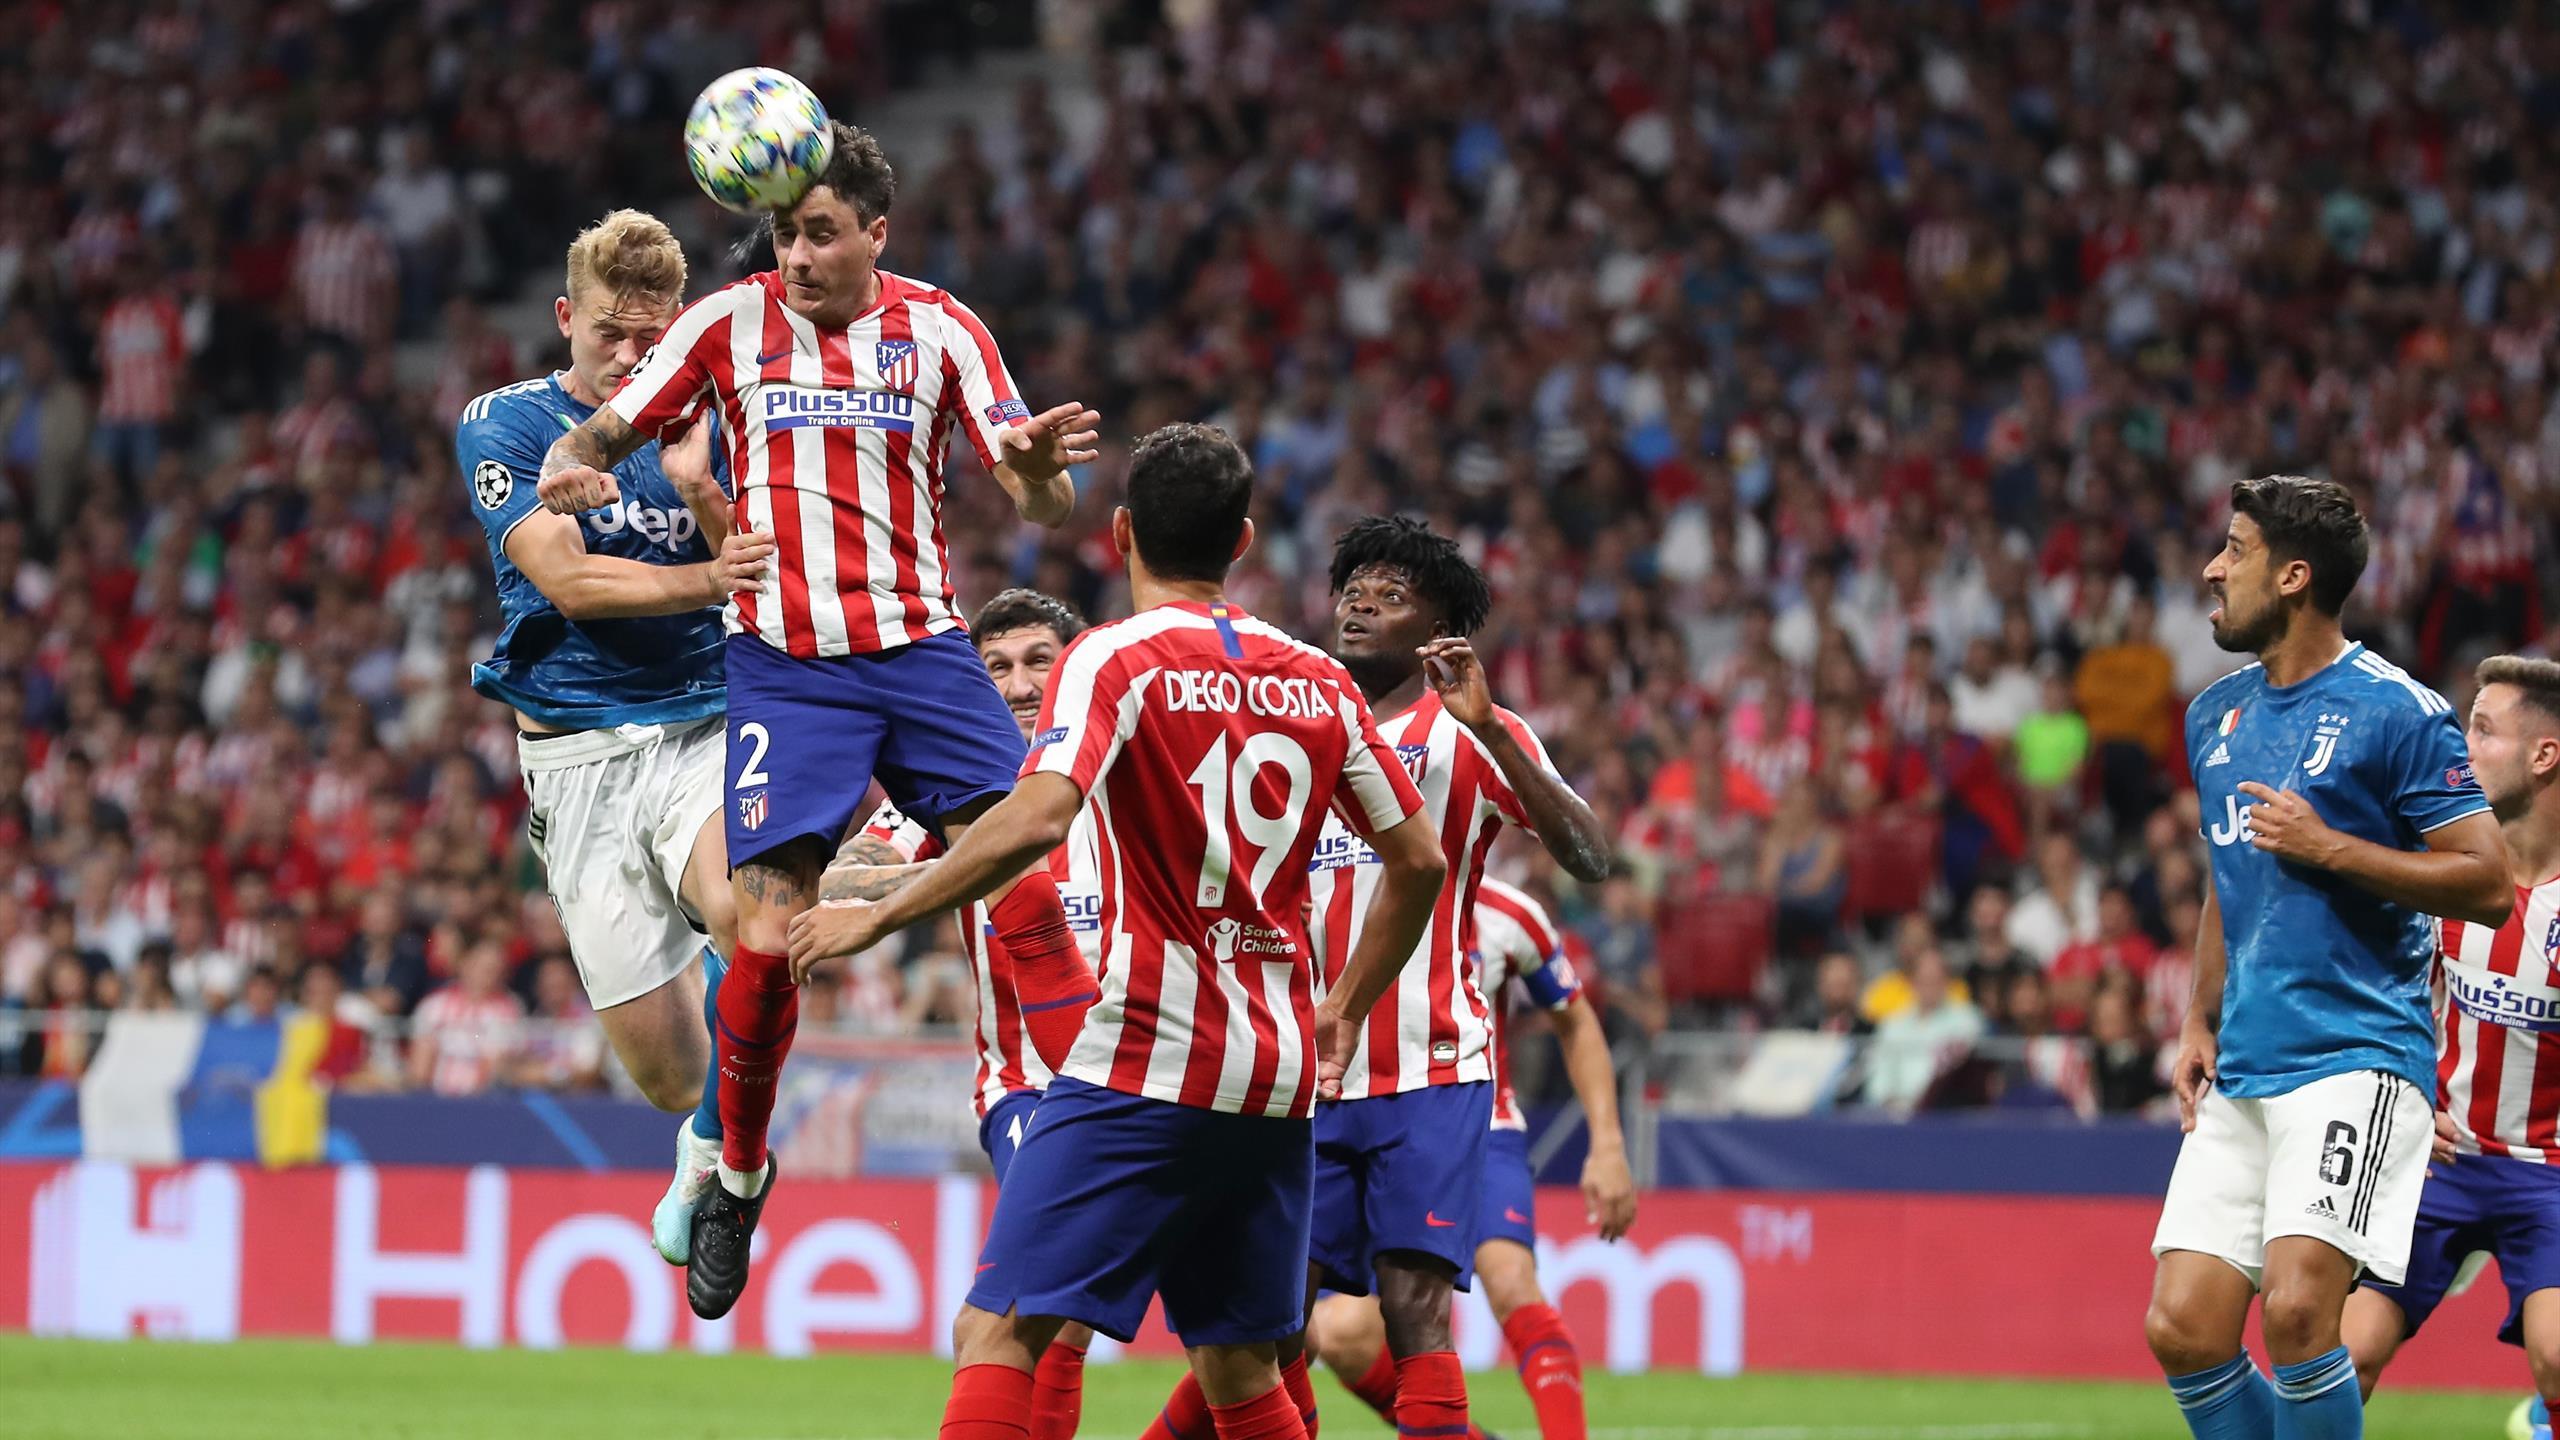 Juventus Atletico Madrid In Diretta Tv E Live Streaming Eurosport